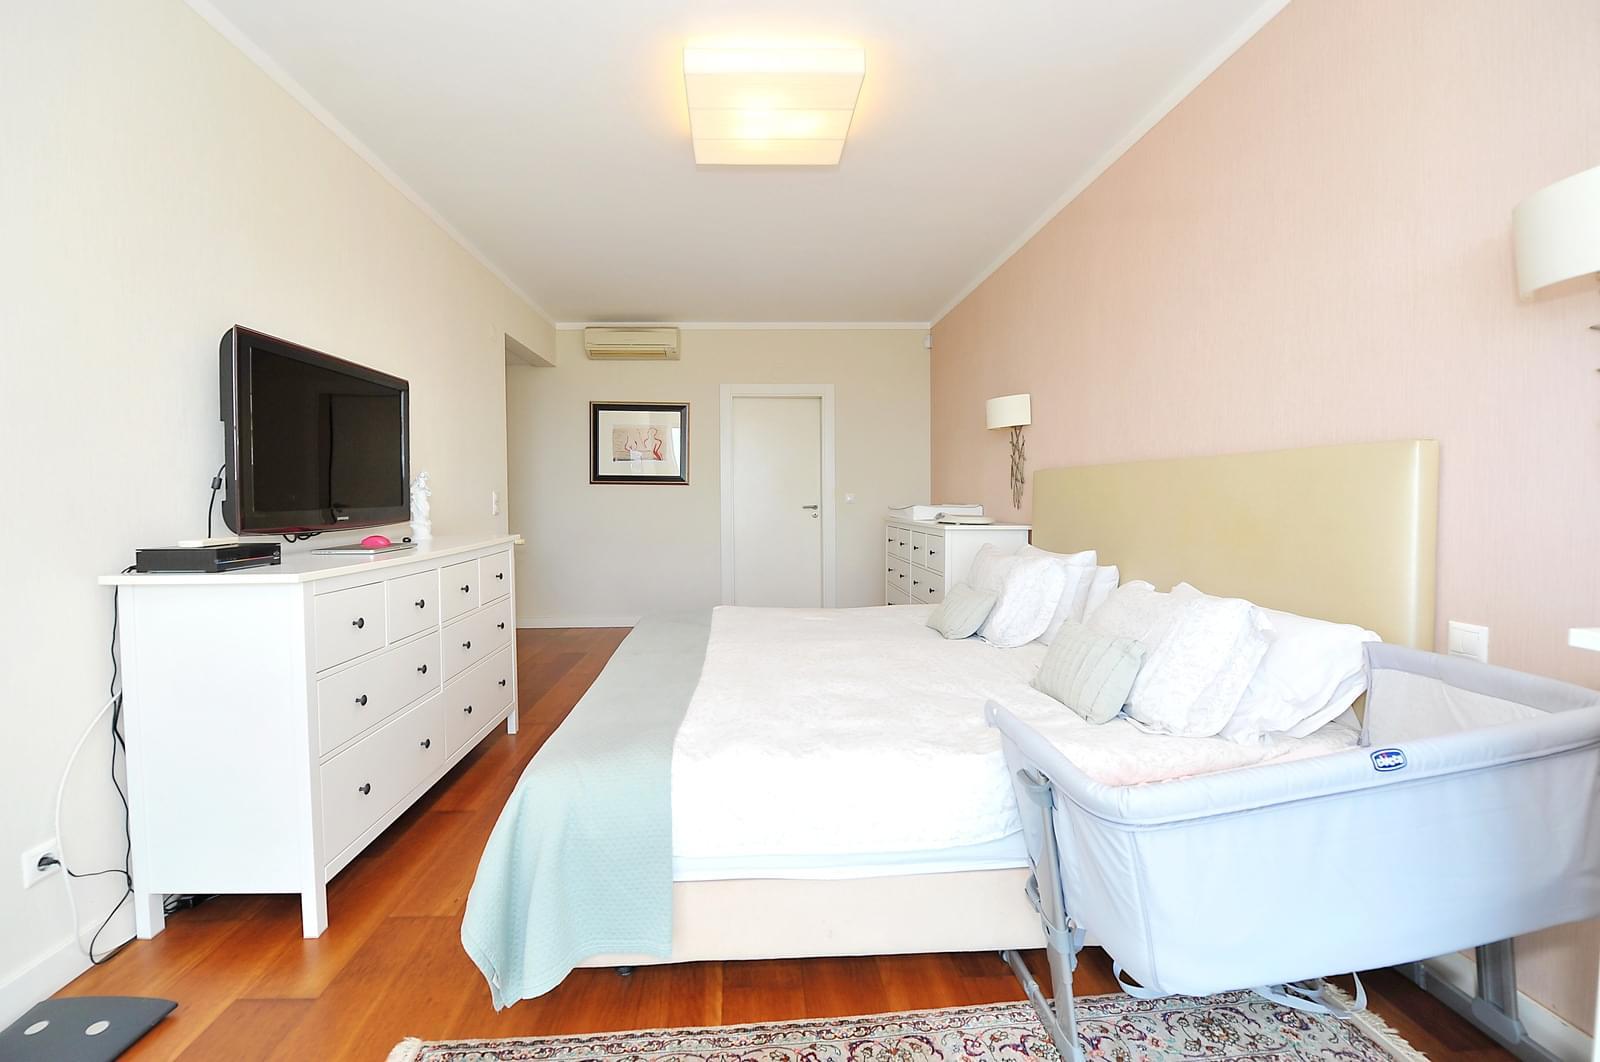 pf16896-apartamento-t4-2-oeiras-976c27ce-f2b3-48e3-b9cf-bc94d60a524e